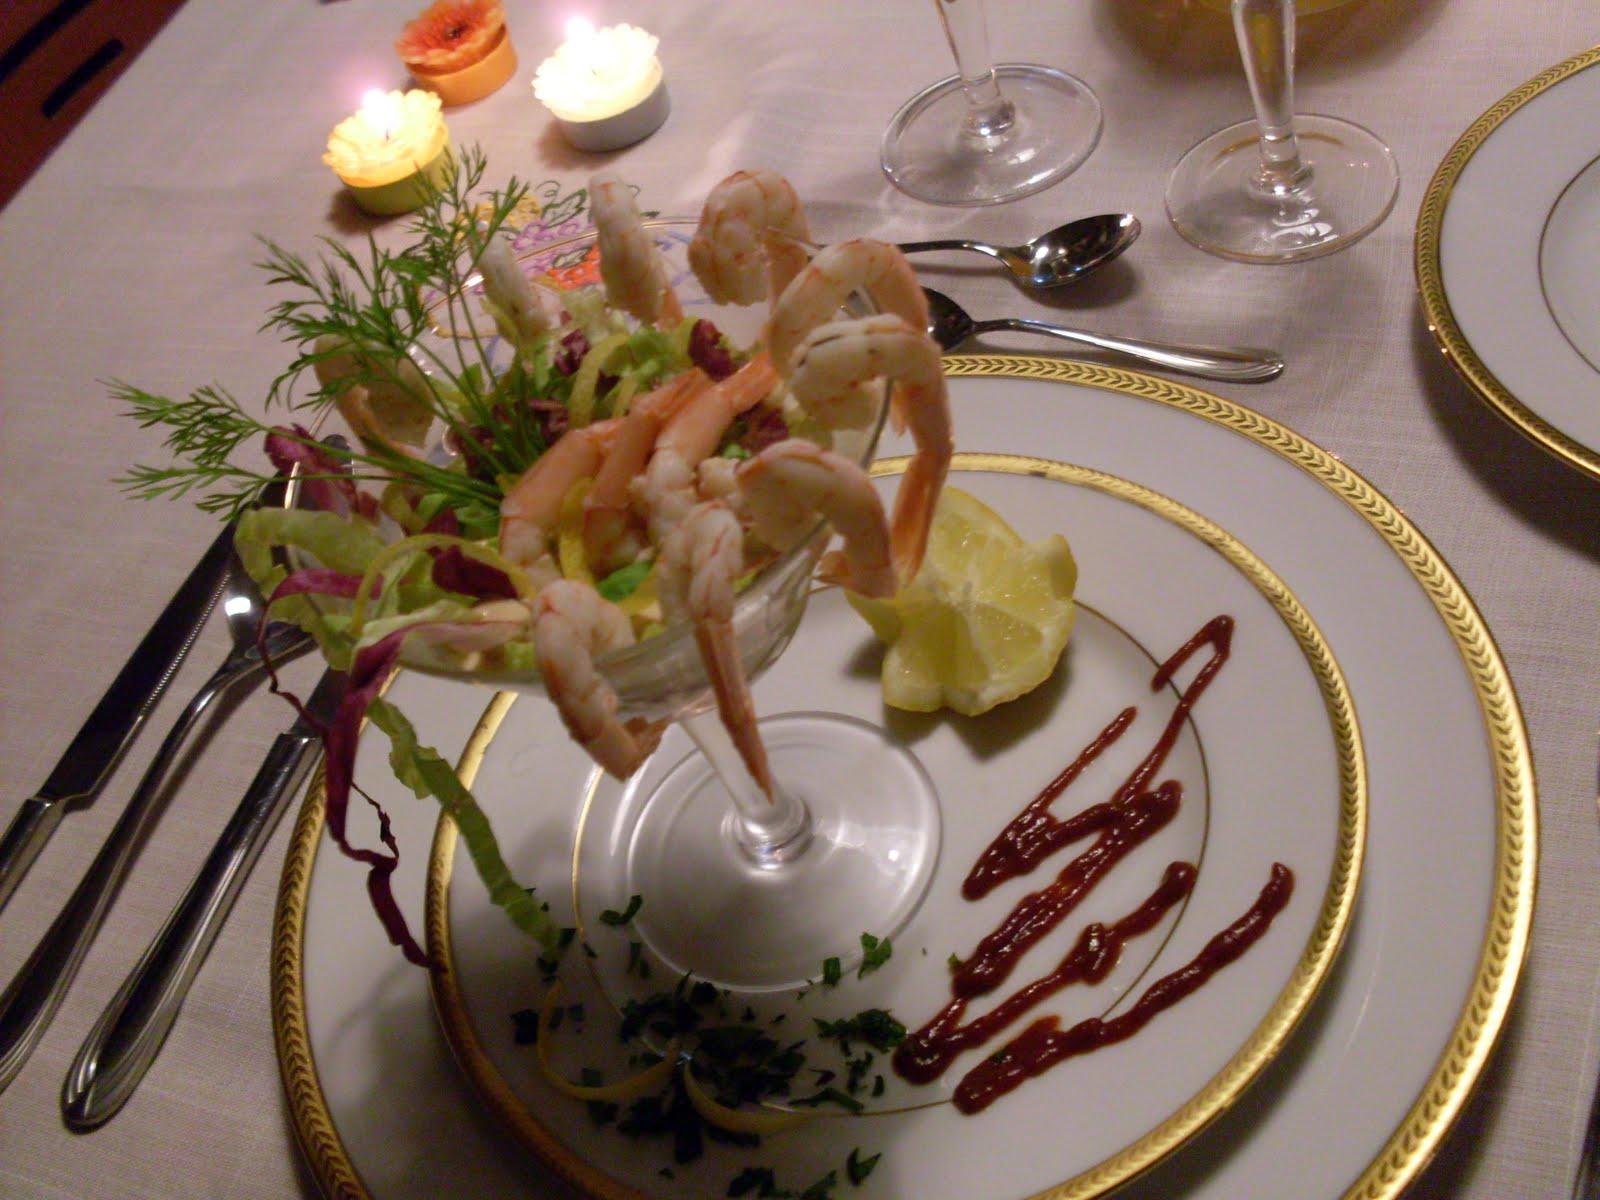 Awesome Decorazione Piatti Cucina Photos - Acomo.us - acomo.us